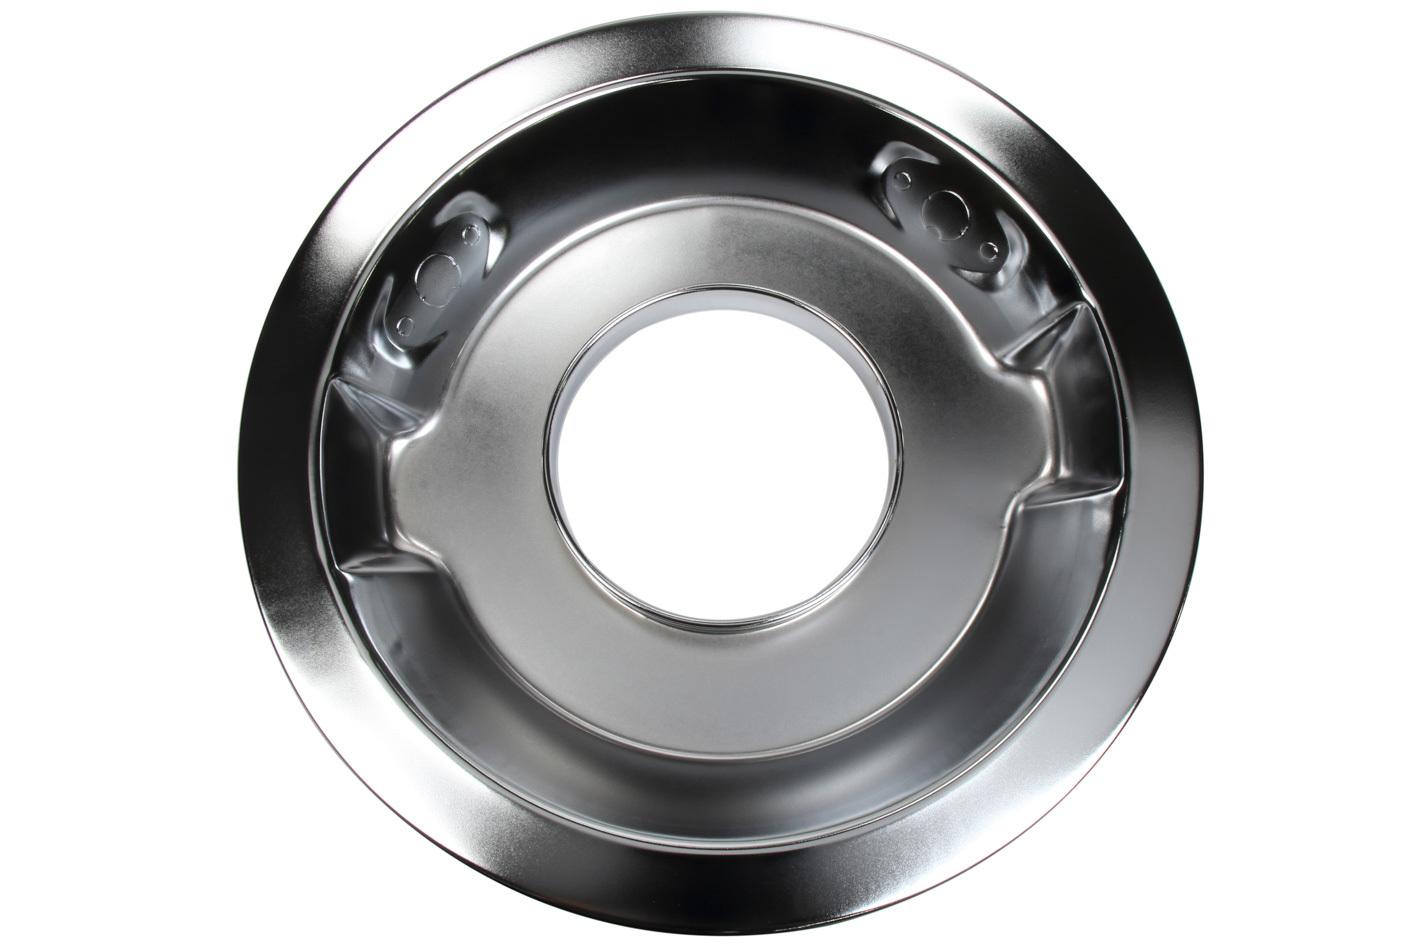 K And N Engineering 14in Drop Base Plate